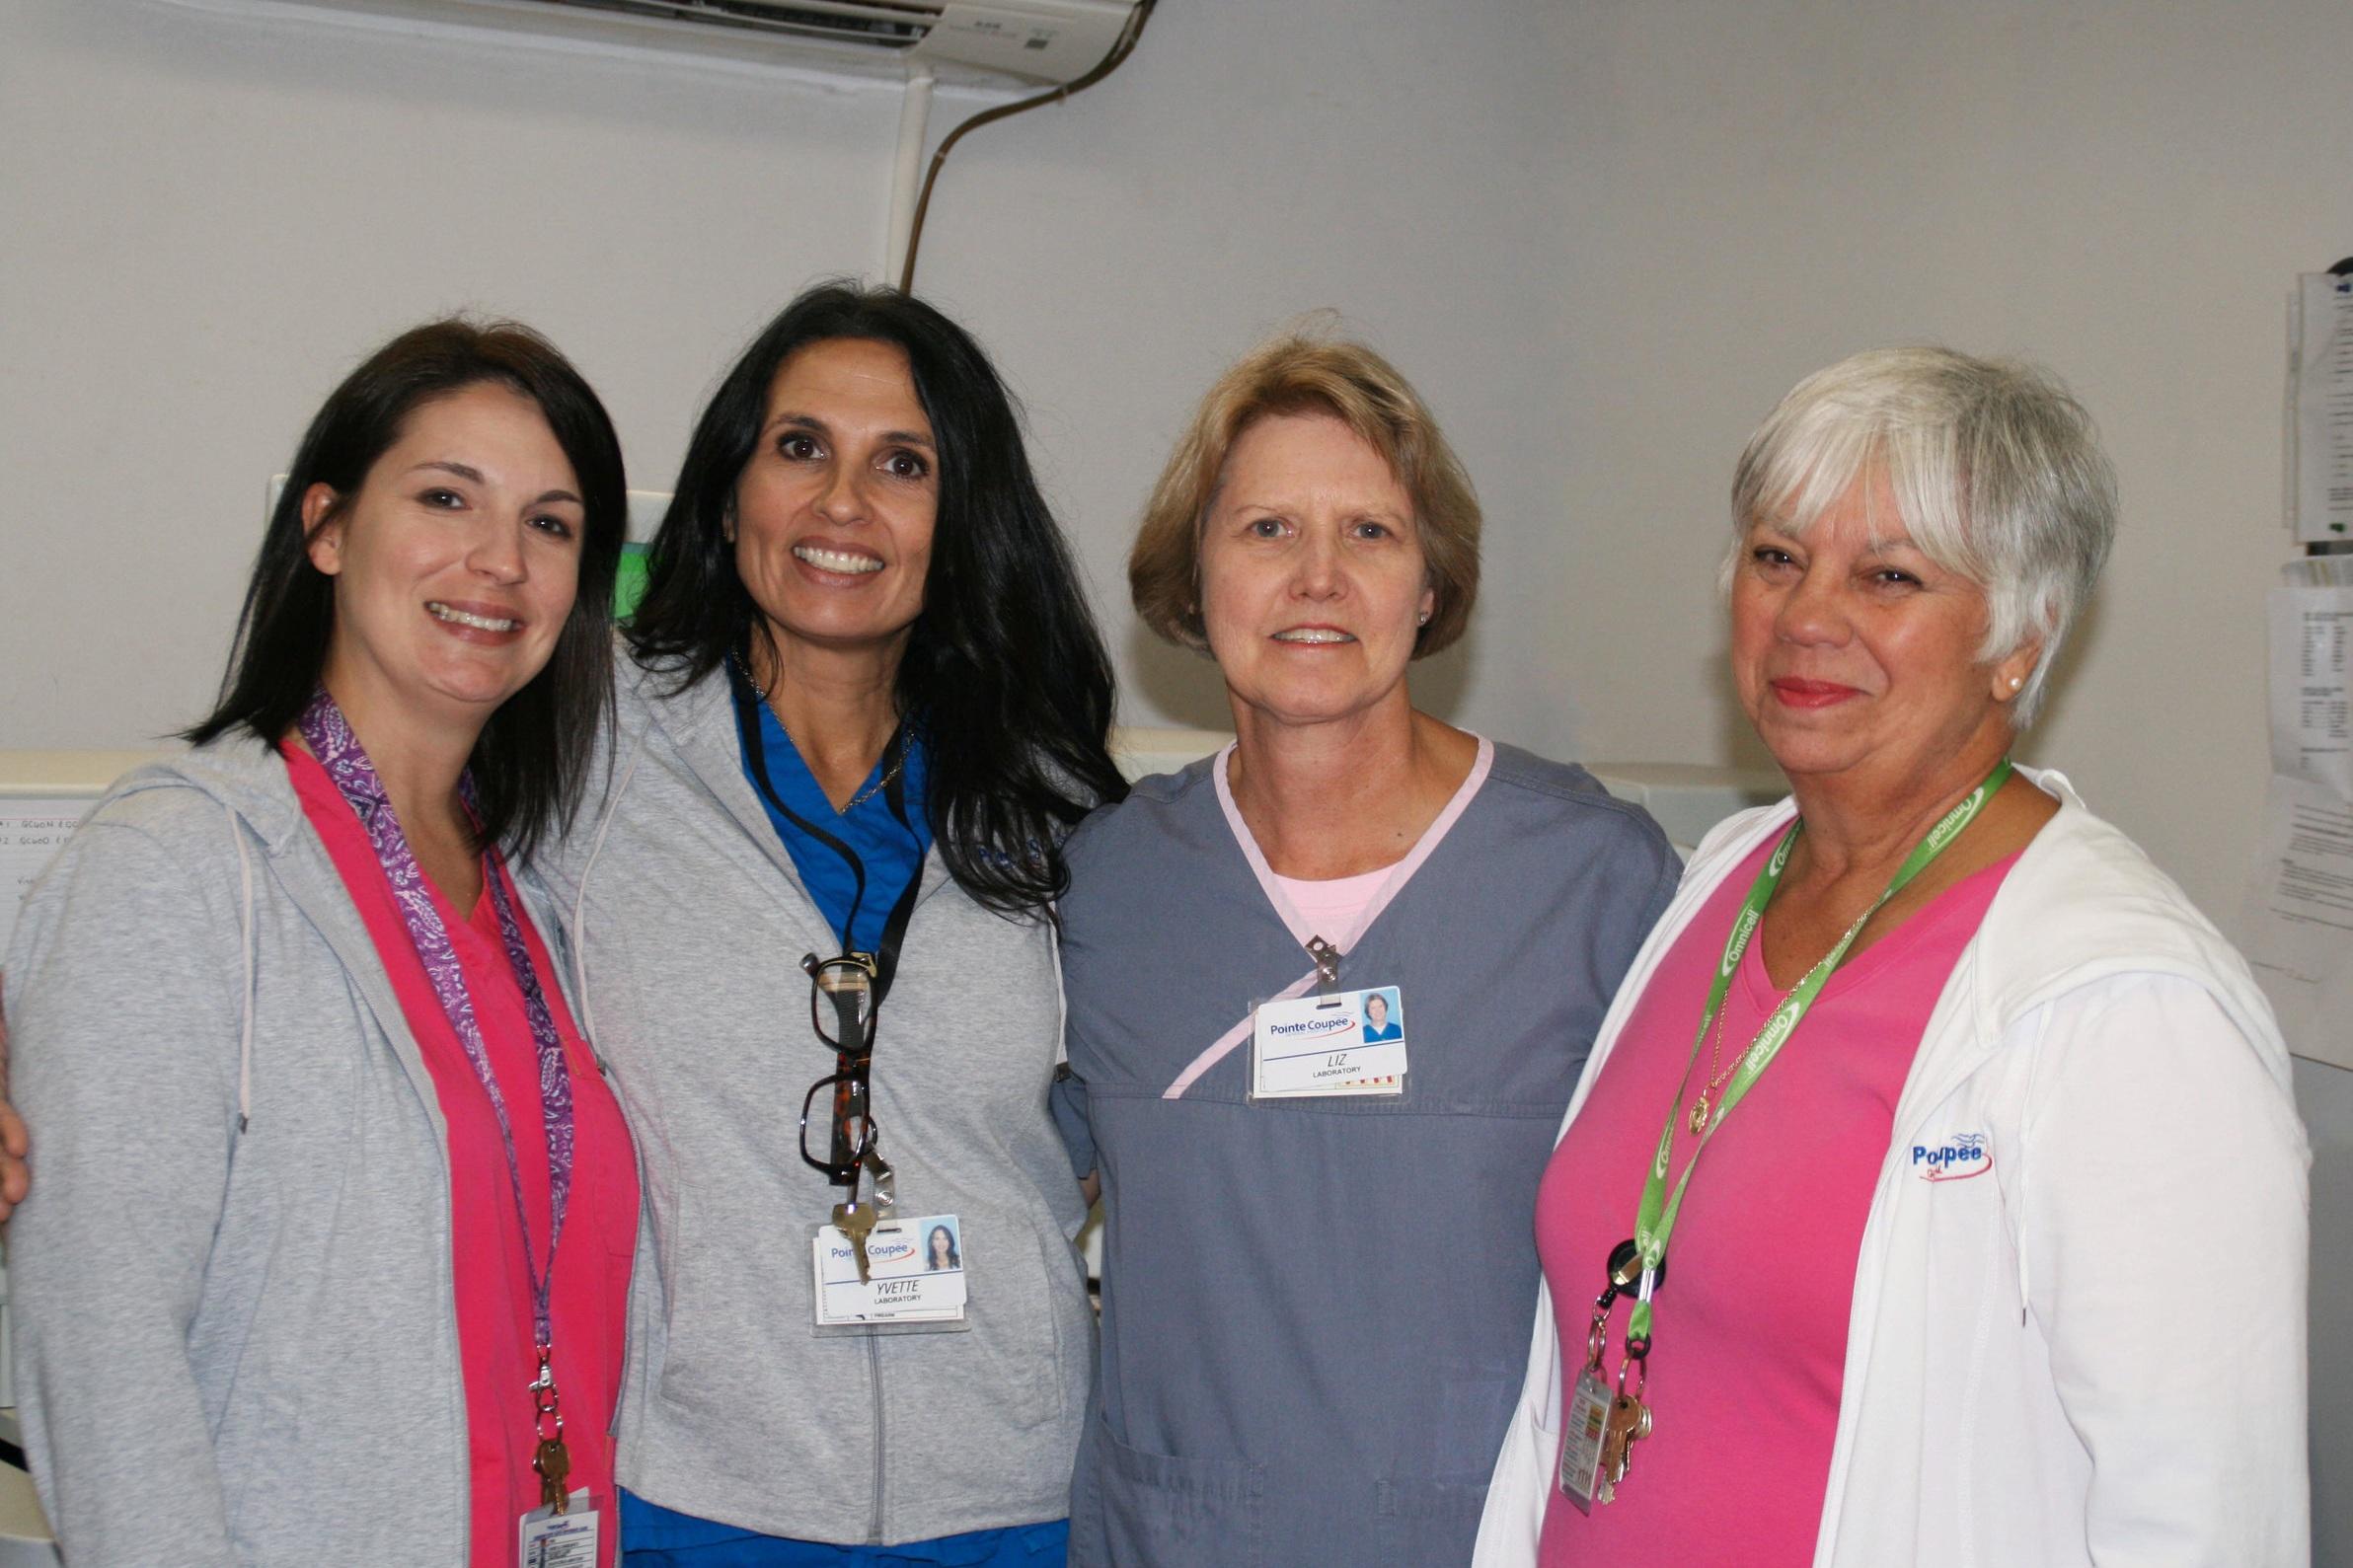 Nicole Pourciau, MT, Yvette Garrett, MT, Assistant Manager, Elizabeth Gosserand, MT, Lab Manager, Mimi Guidroz, MT